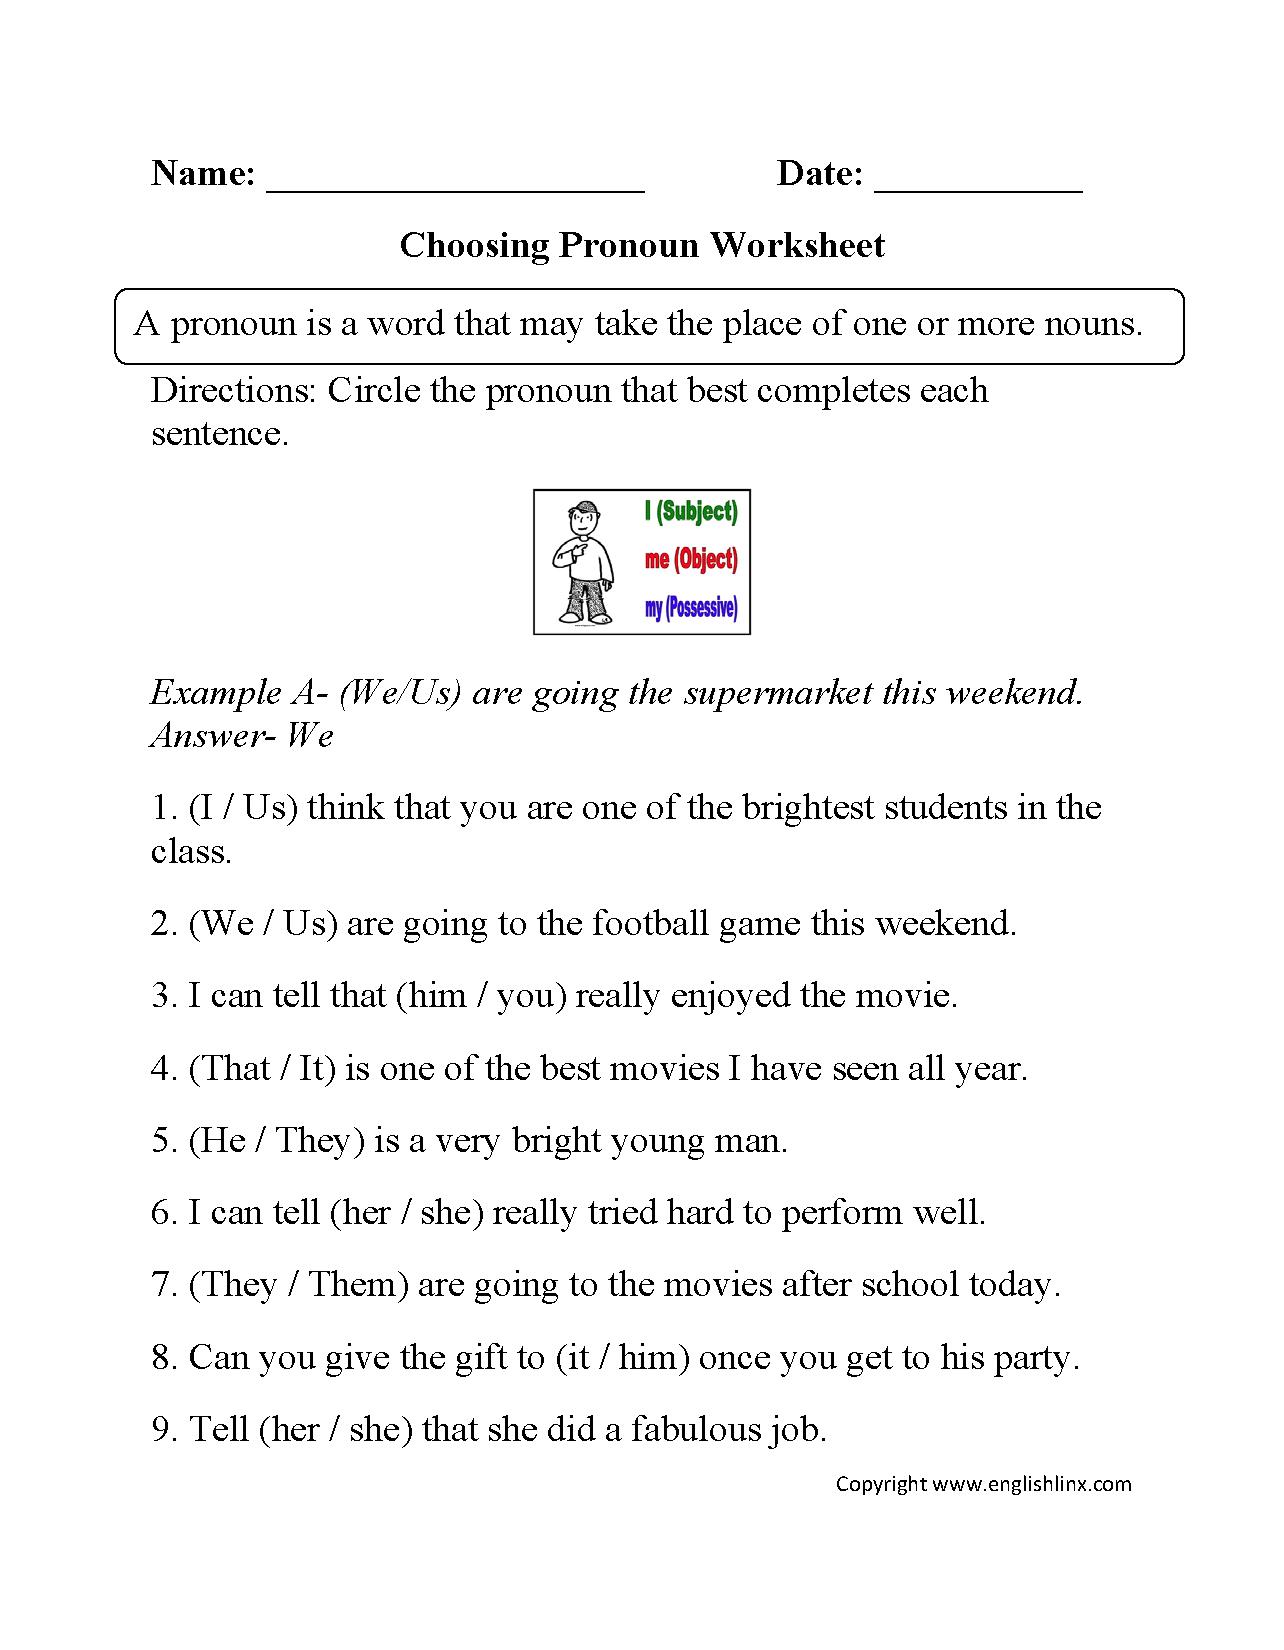 Grammar Worksheets | Parts Of Speech Worksheets - Free Printable | Free Printable Parts Of Speech Worksheets